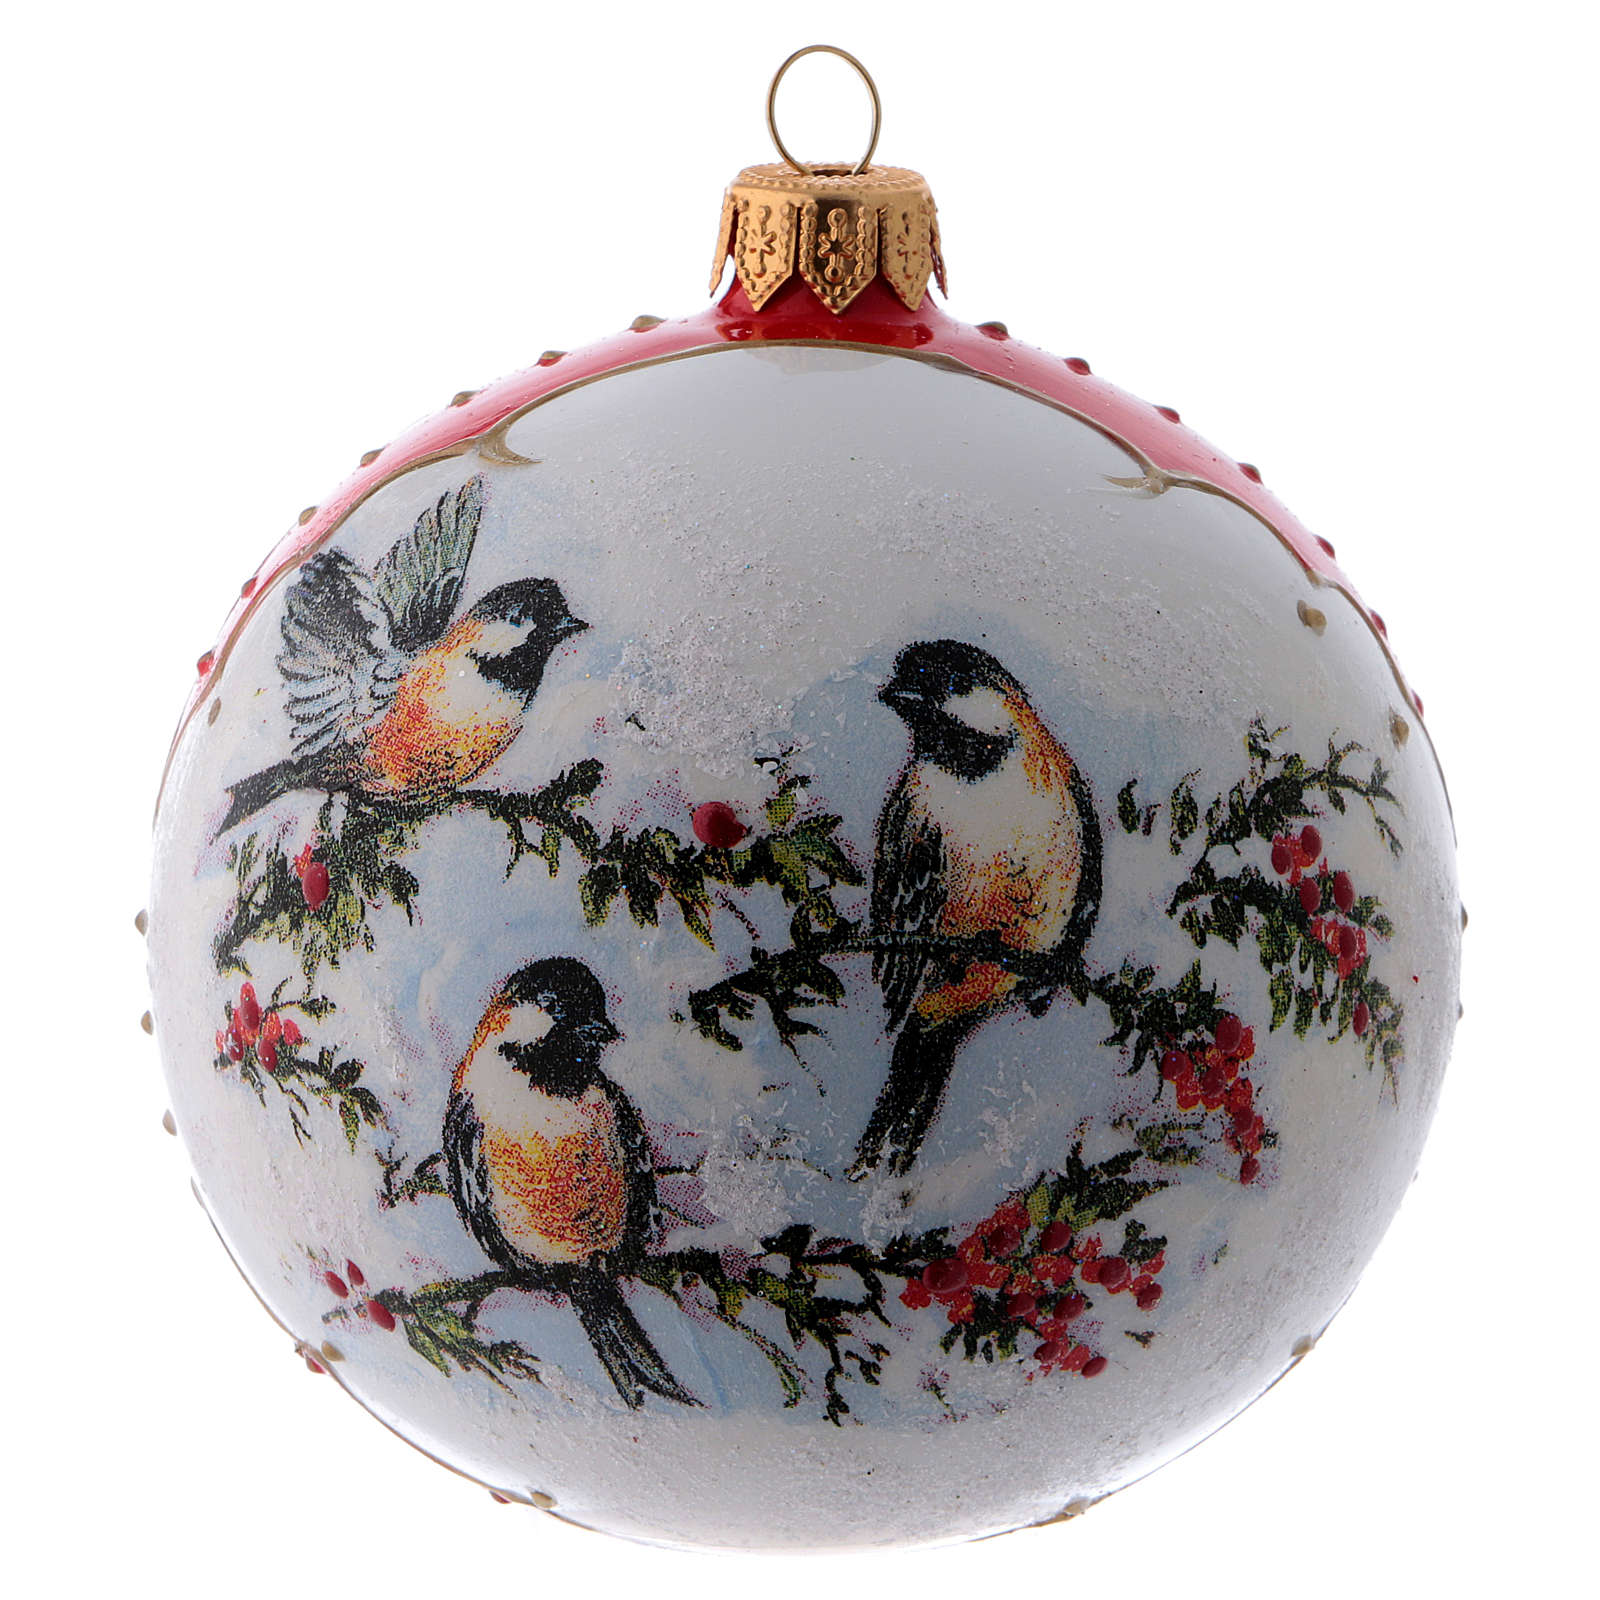 Bola Navidad vidrio blanco adorno pájaros sobre ramas de acebo 100 mm 4